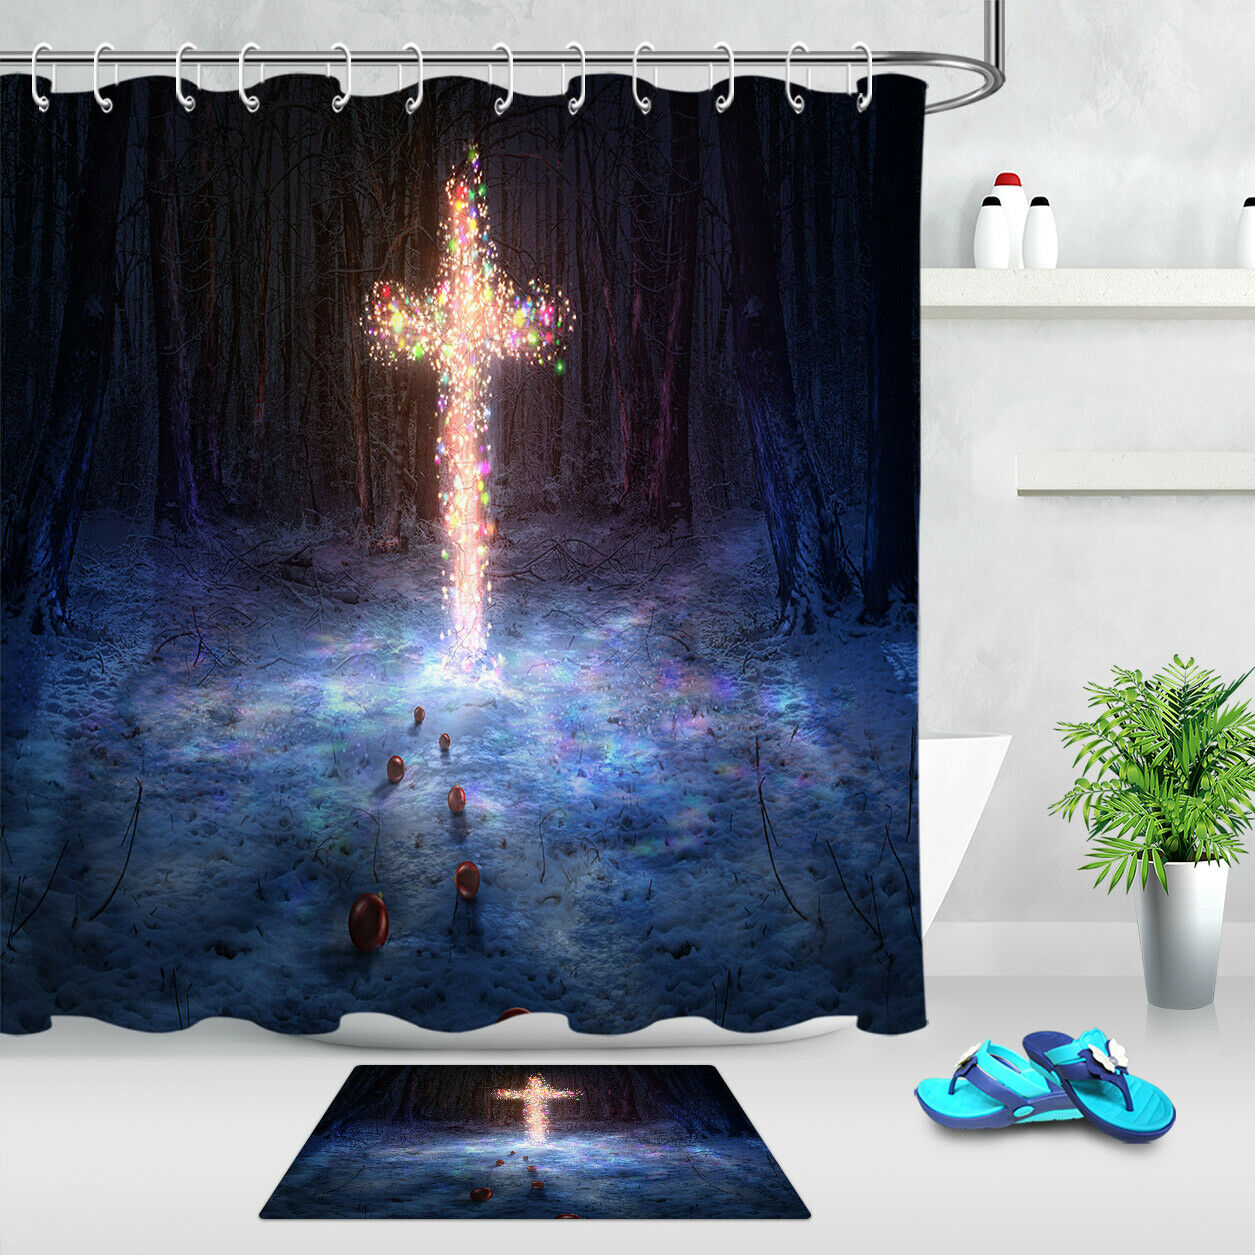 Dreaming Light Jesus Cross Bathroom Shower Curtain Set Waterproof Fabric Hooks